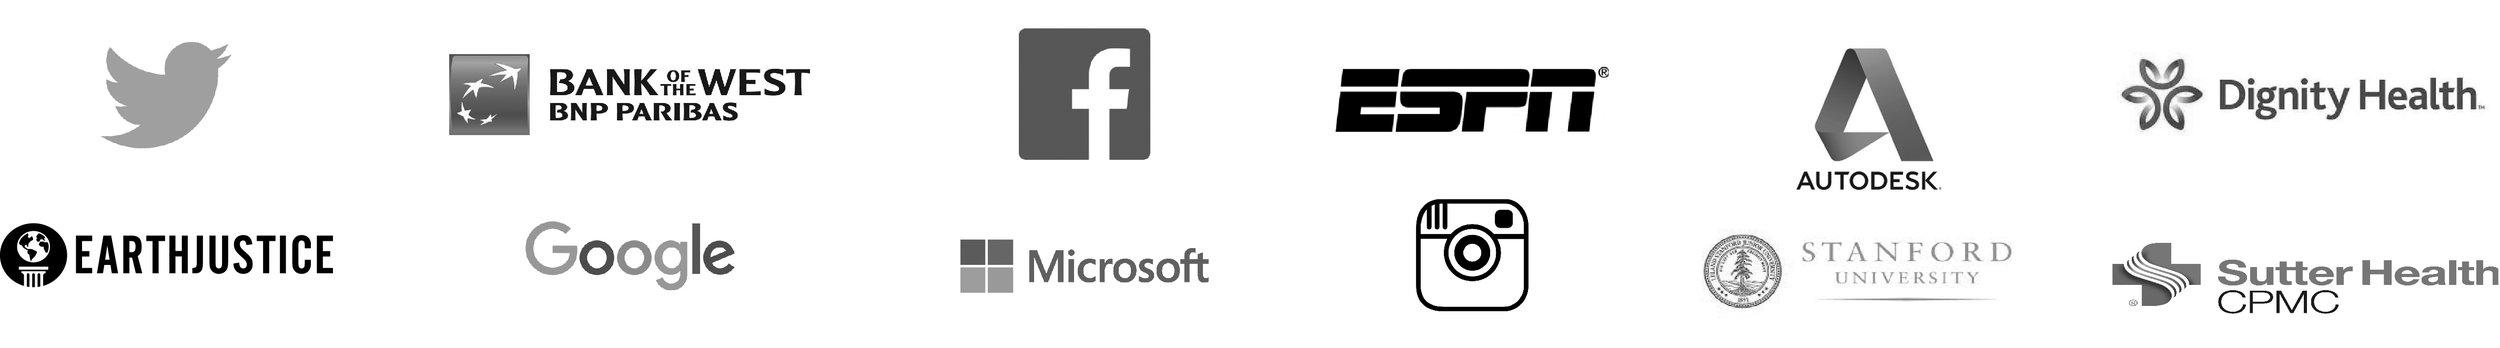 logos4-2.jpg